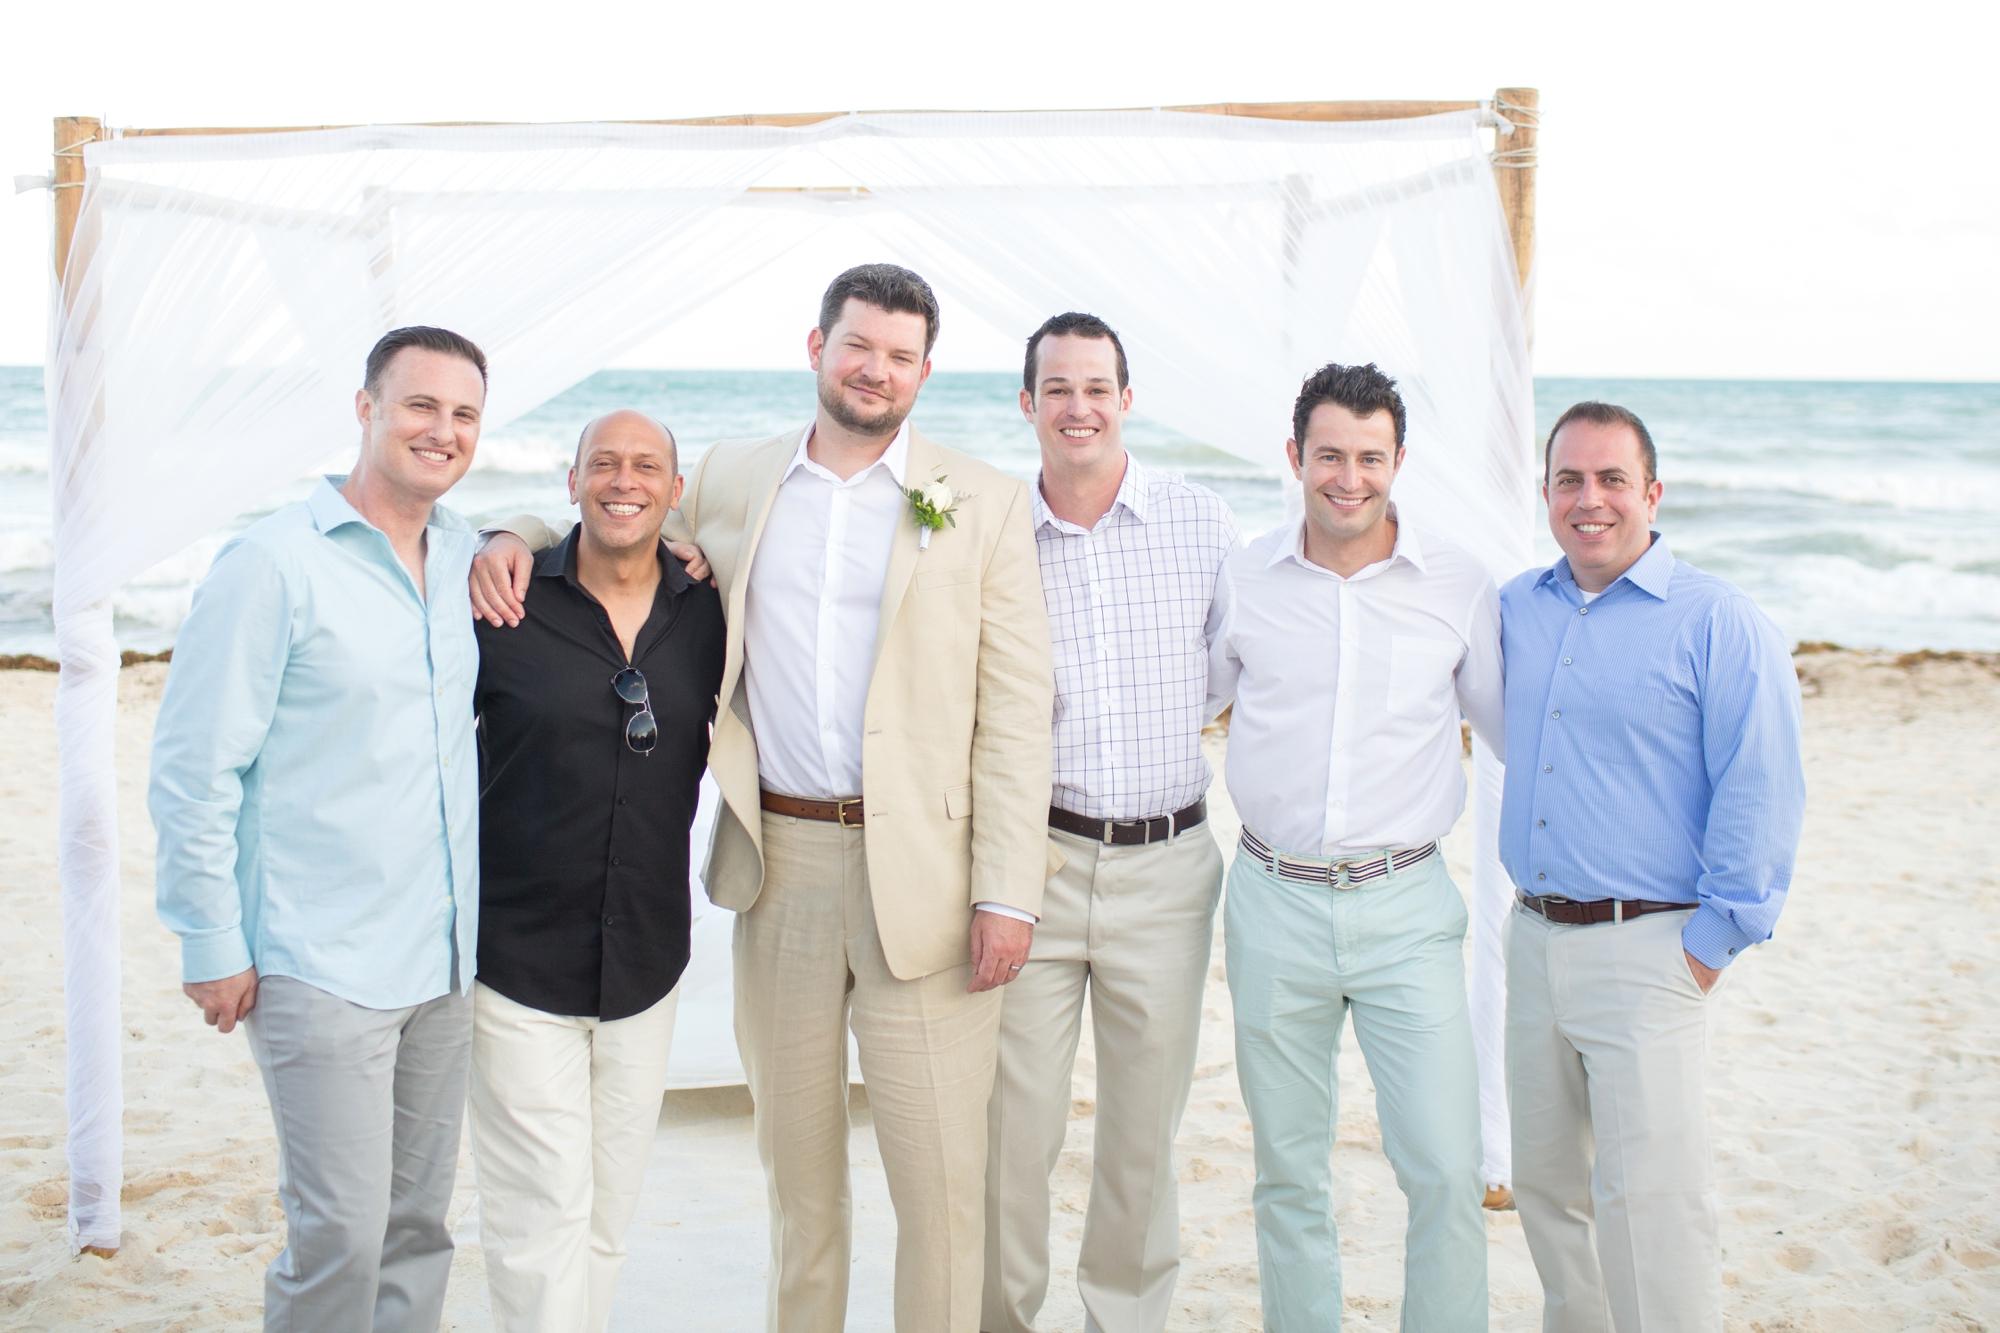 Morosoff Wedding 3-Family Formals-333_anna grace photography destination wedding photographer playa del carmen mexico photo.jpg